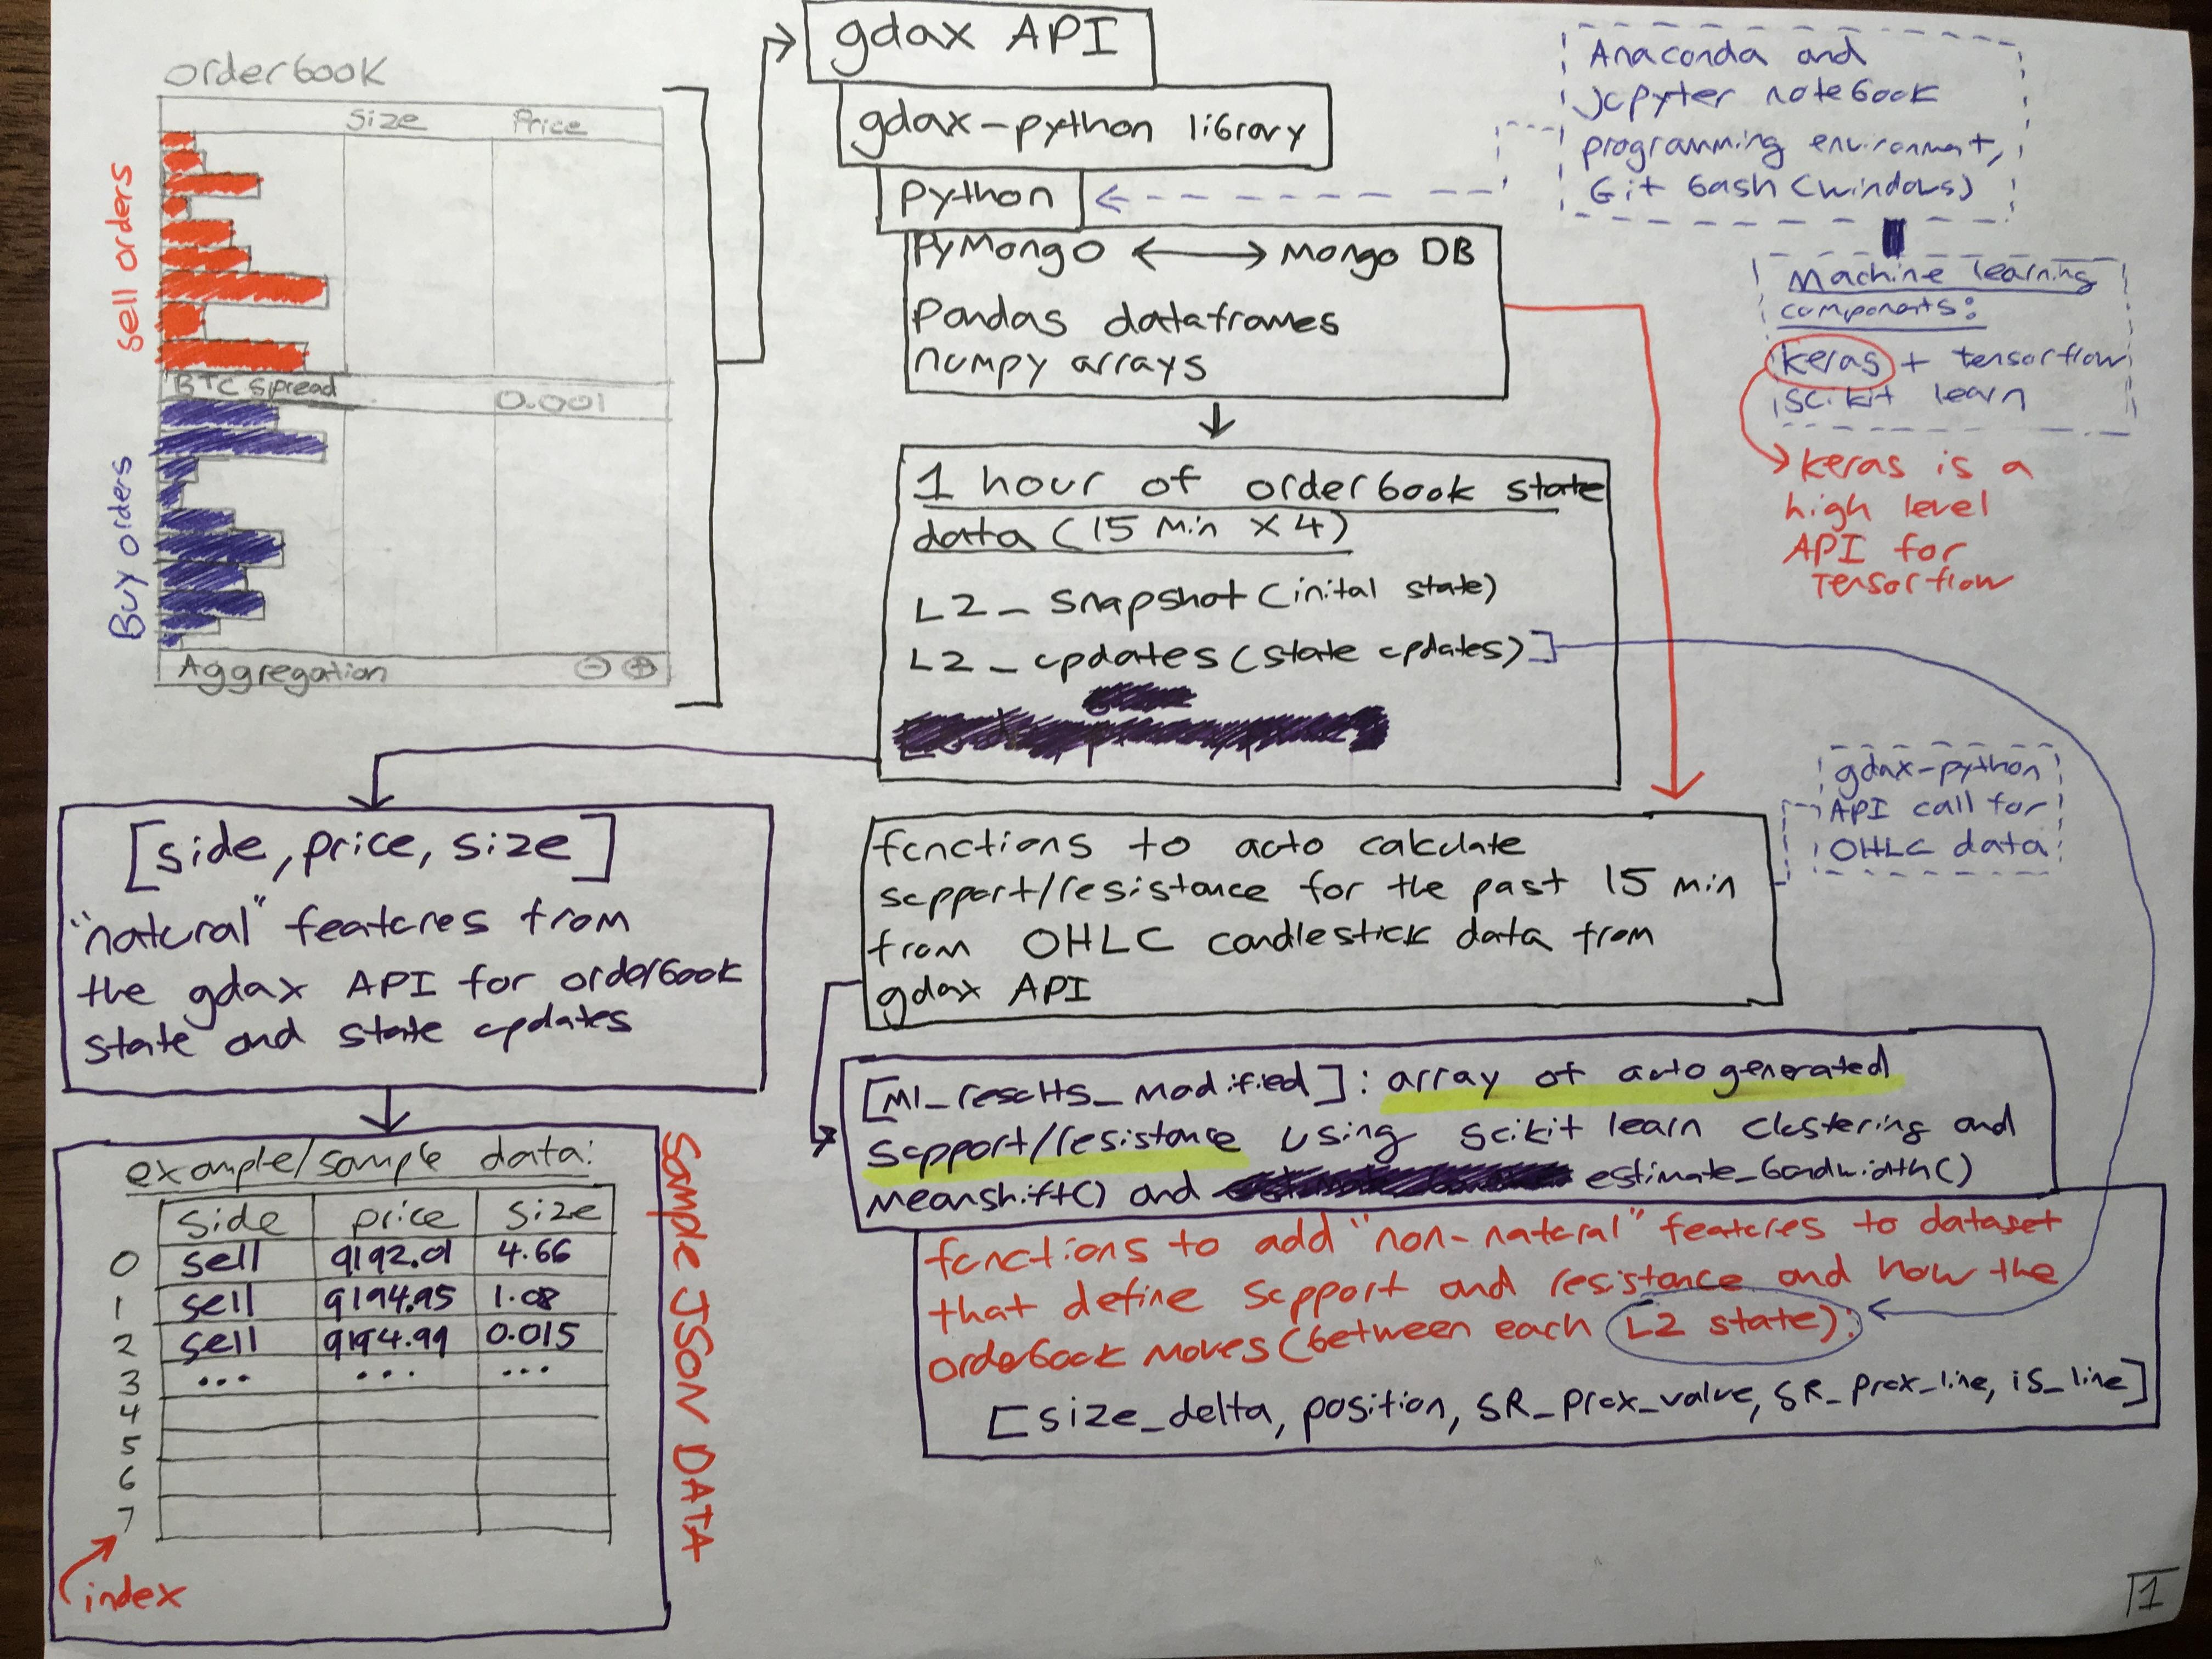 General API/data structure: